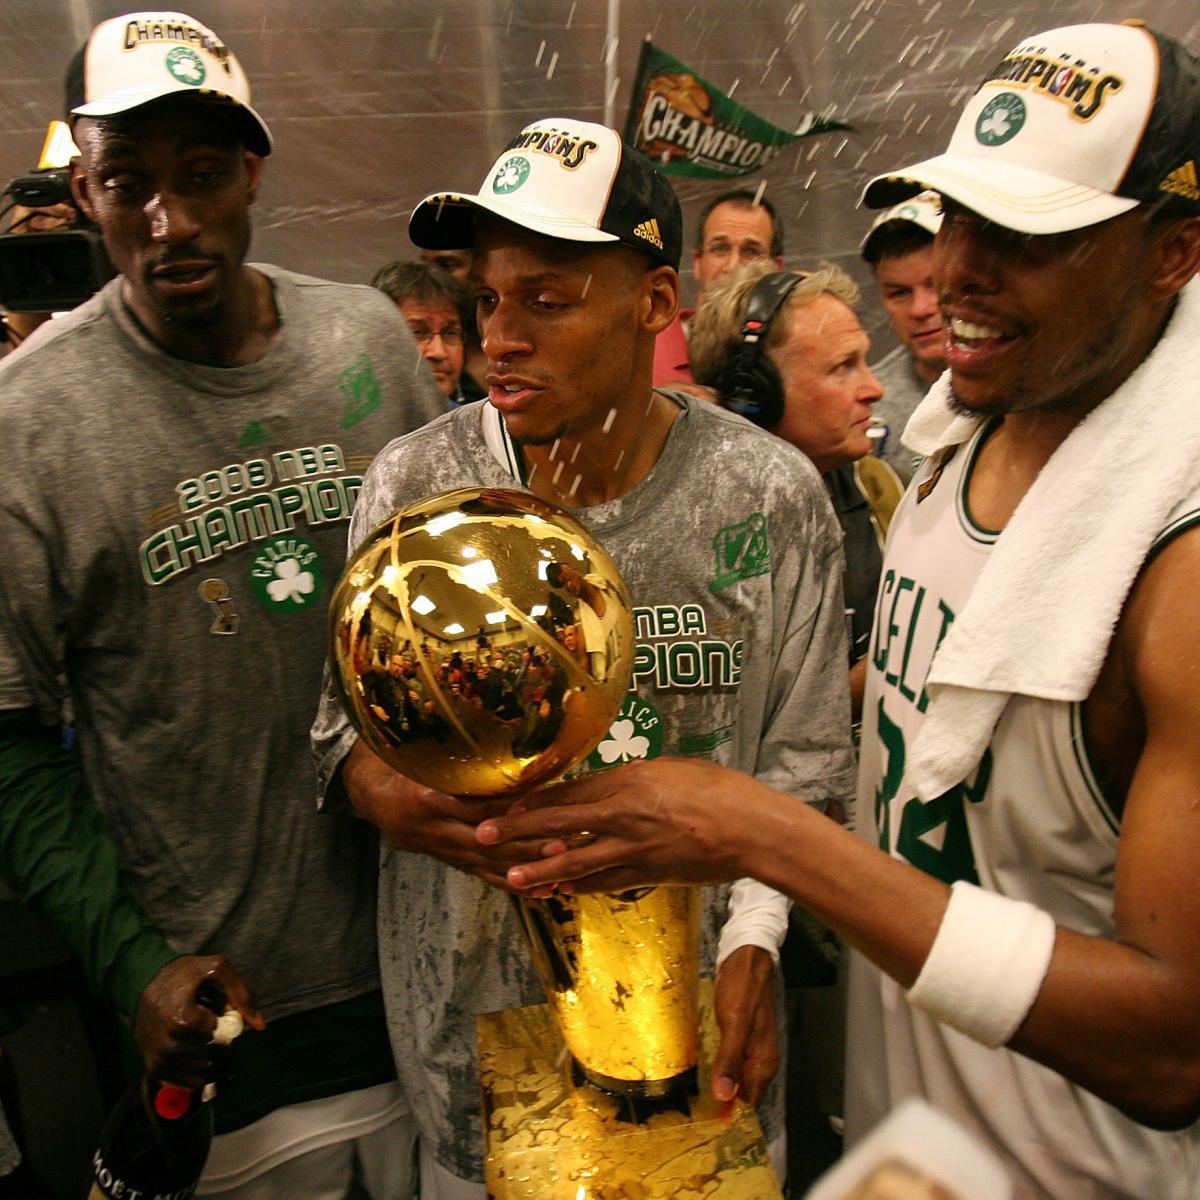 Boston Knew Celtics